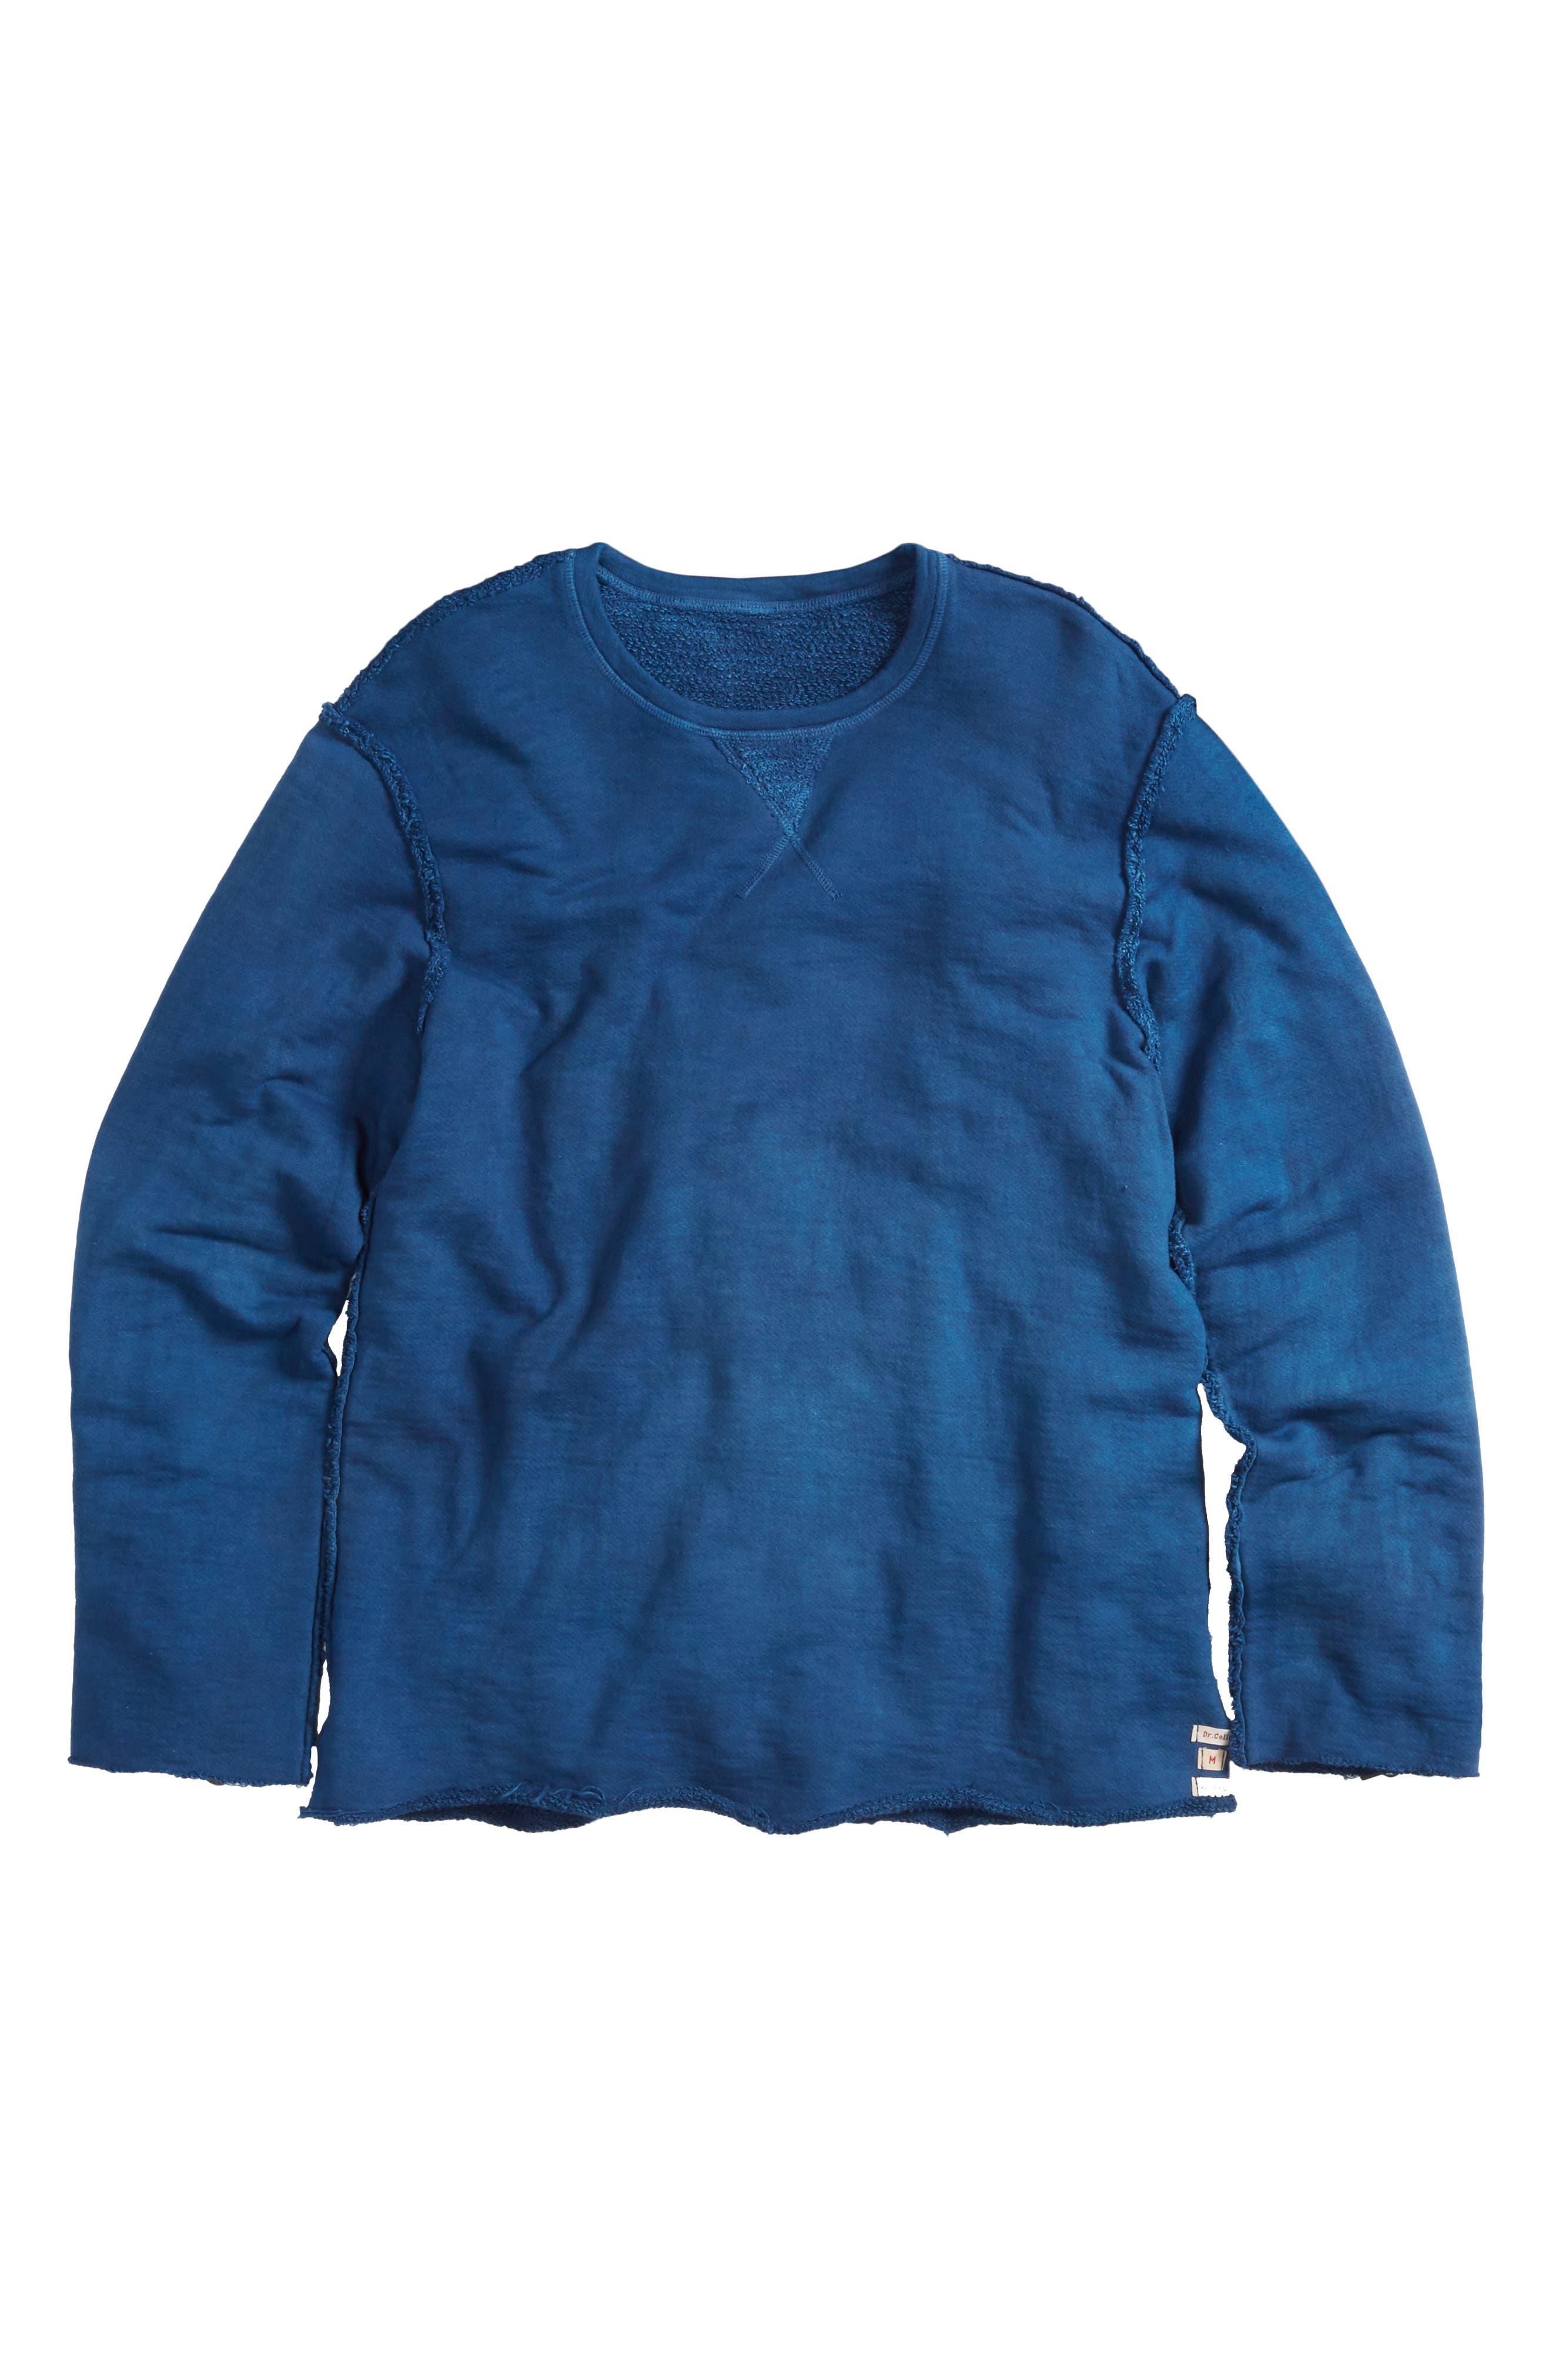 Alternate Image 1 Selected - Dr. Collectors Malibu Reversible Sweatshirt